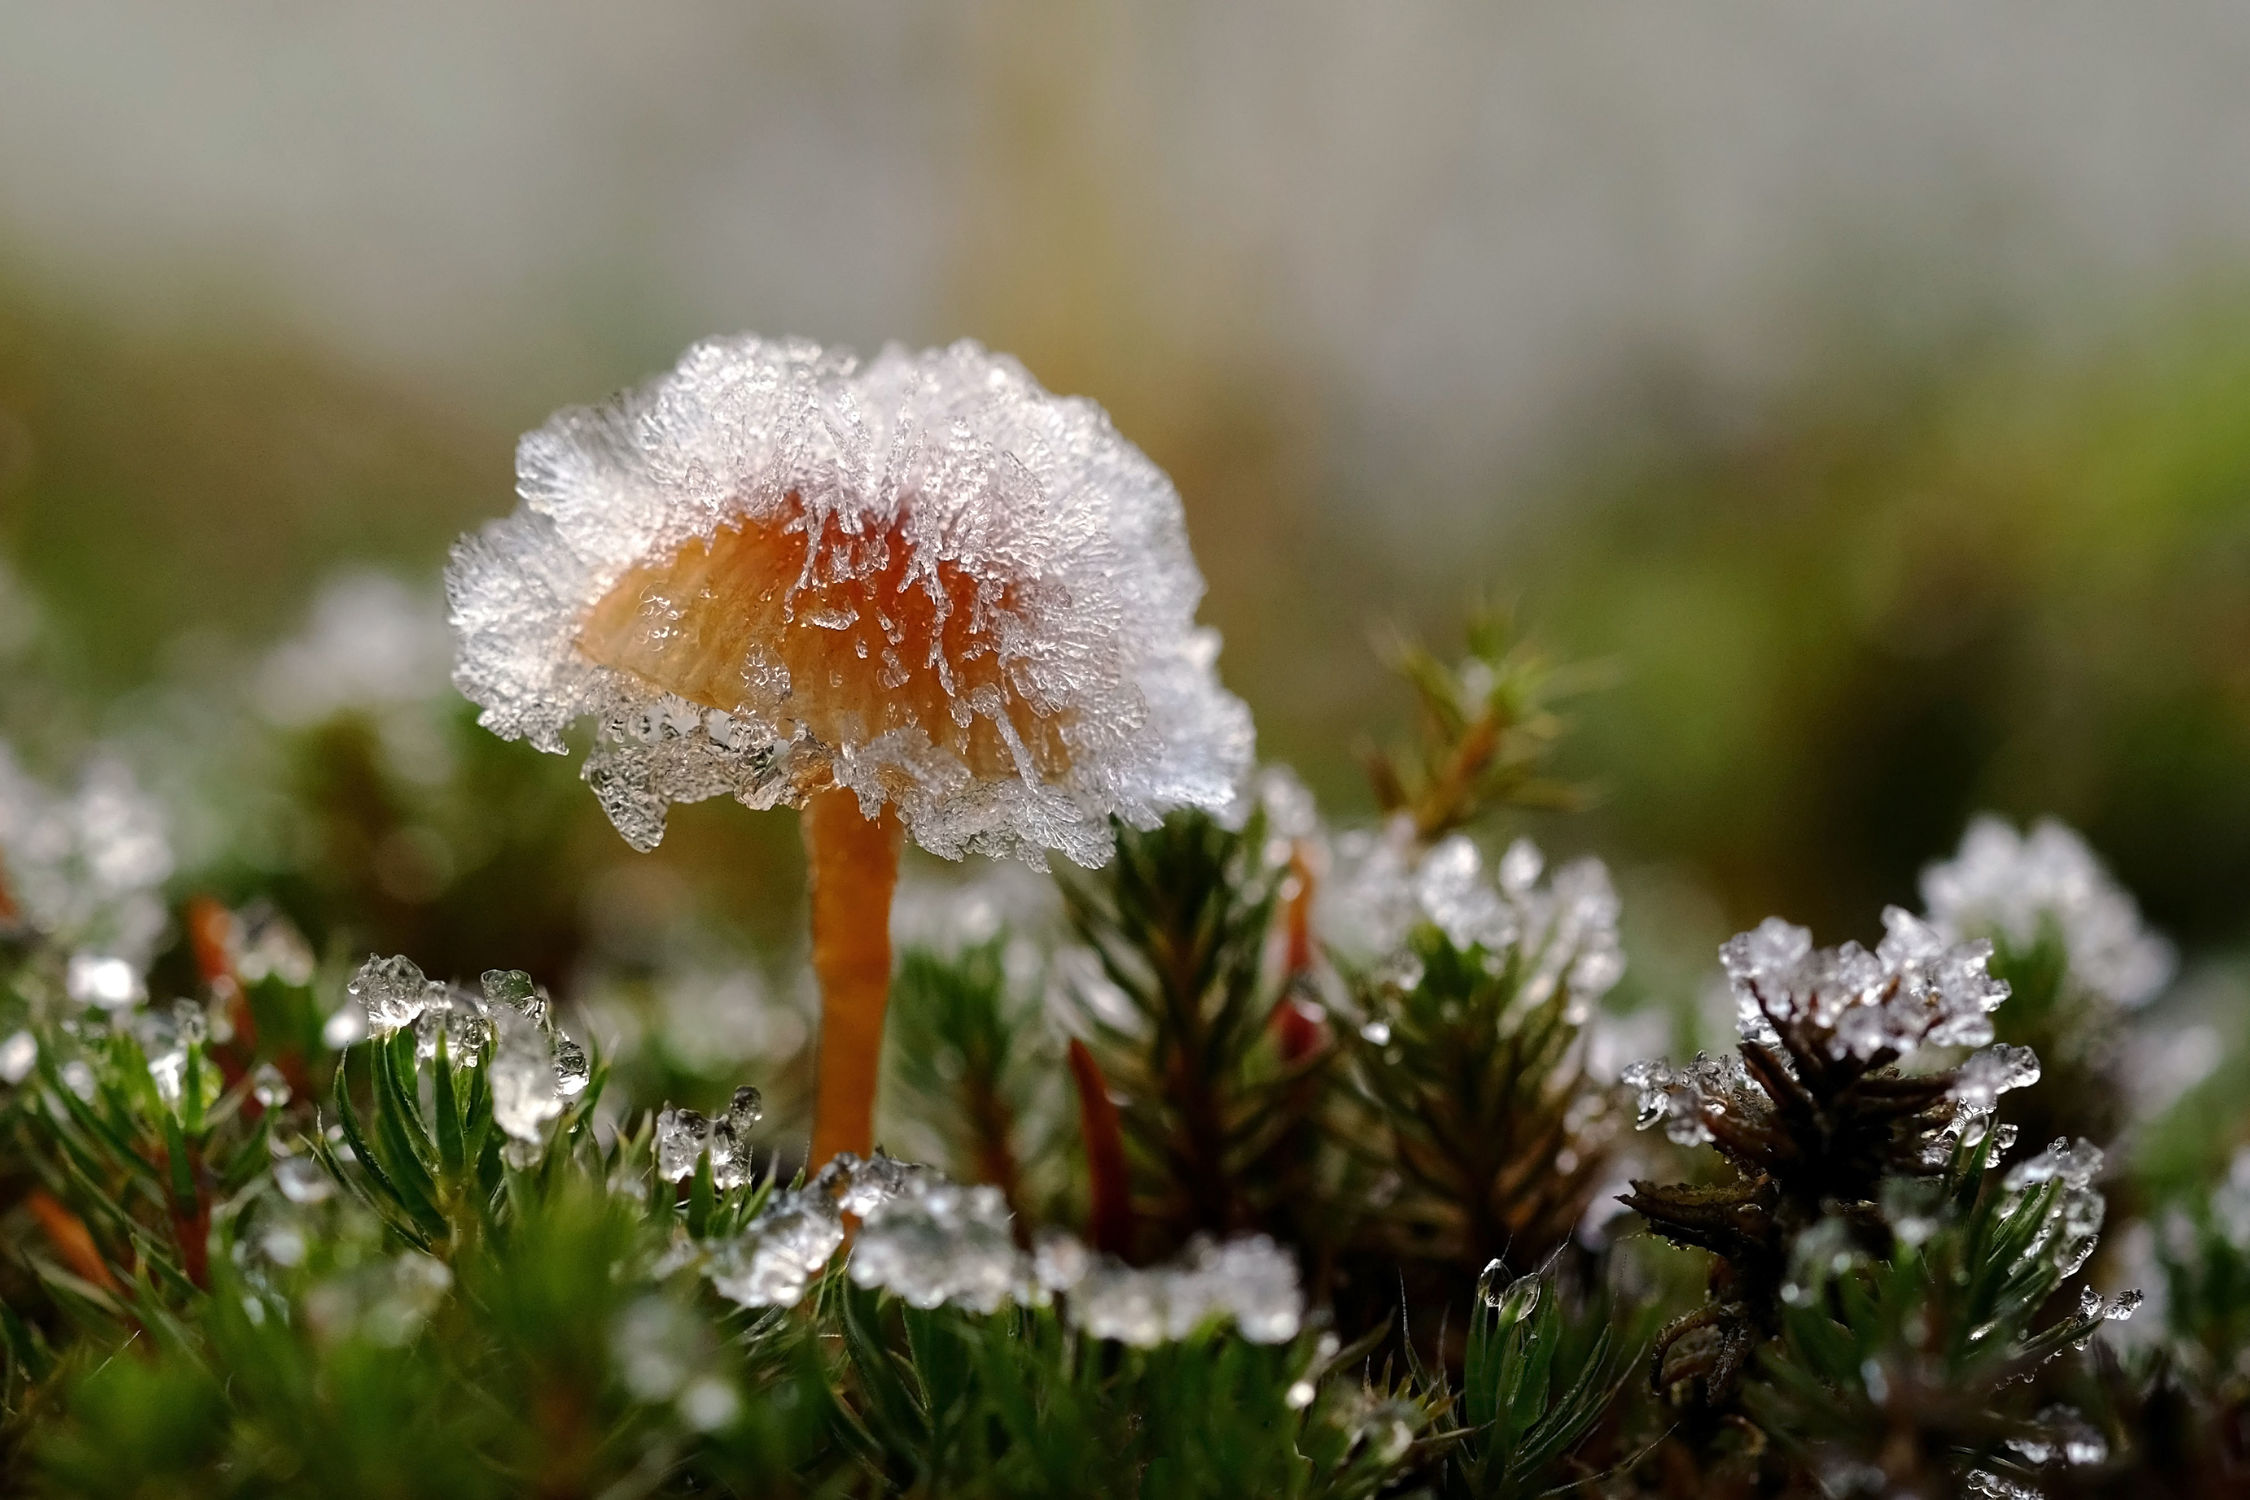 Bild mit Natur, Gräser, Winter, Wälder, Herbst, Felder, Pilze, Frost, Wiesen, Wandern, Moose, Leben, Raureif, Farne, sterben, Eiskrone, Tod, Krönung